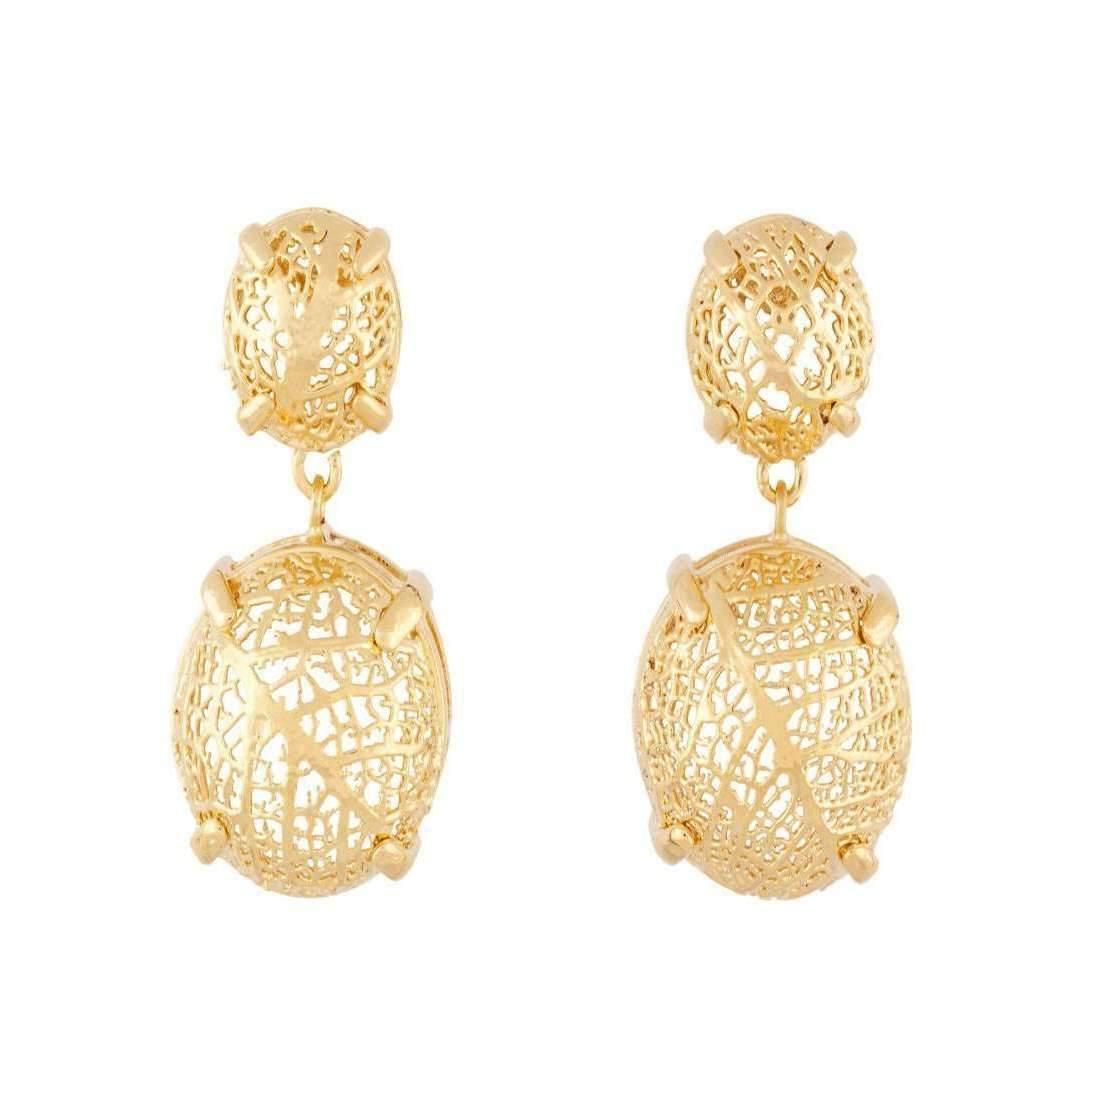 Amazona Secrets 18kt Gold Savannah Box Earring With Claws qYf7jheFq